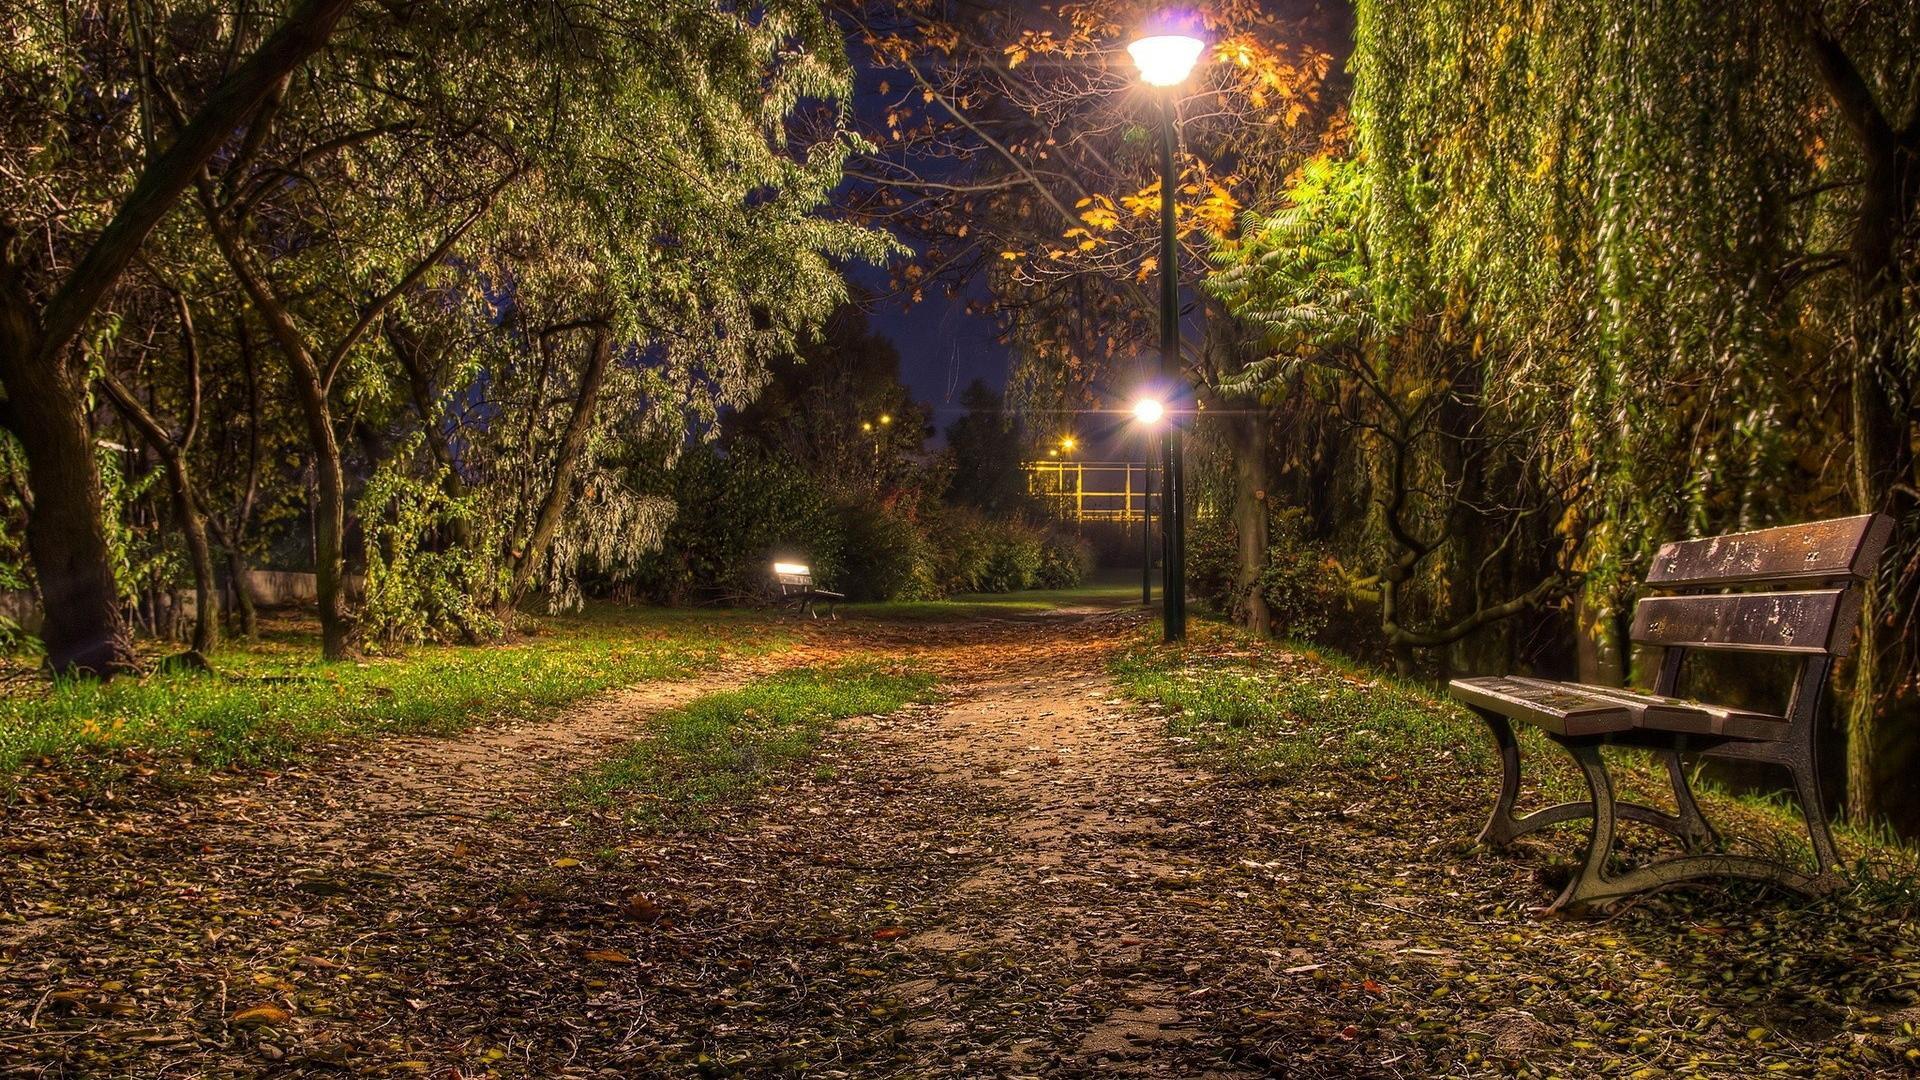 nighttime halloween games